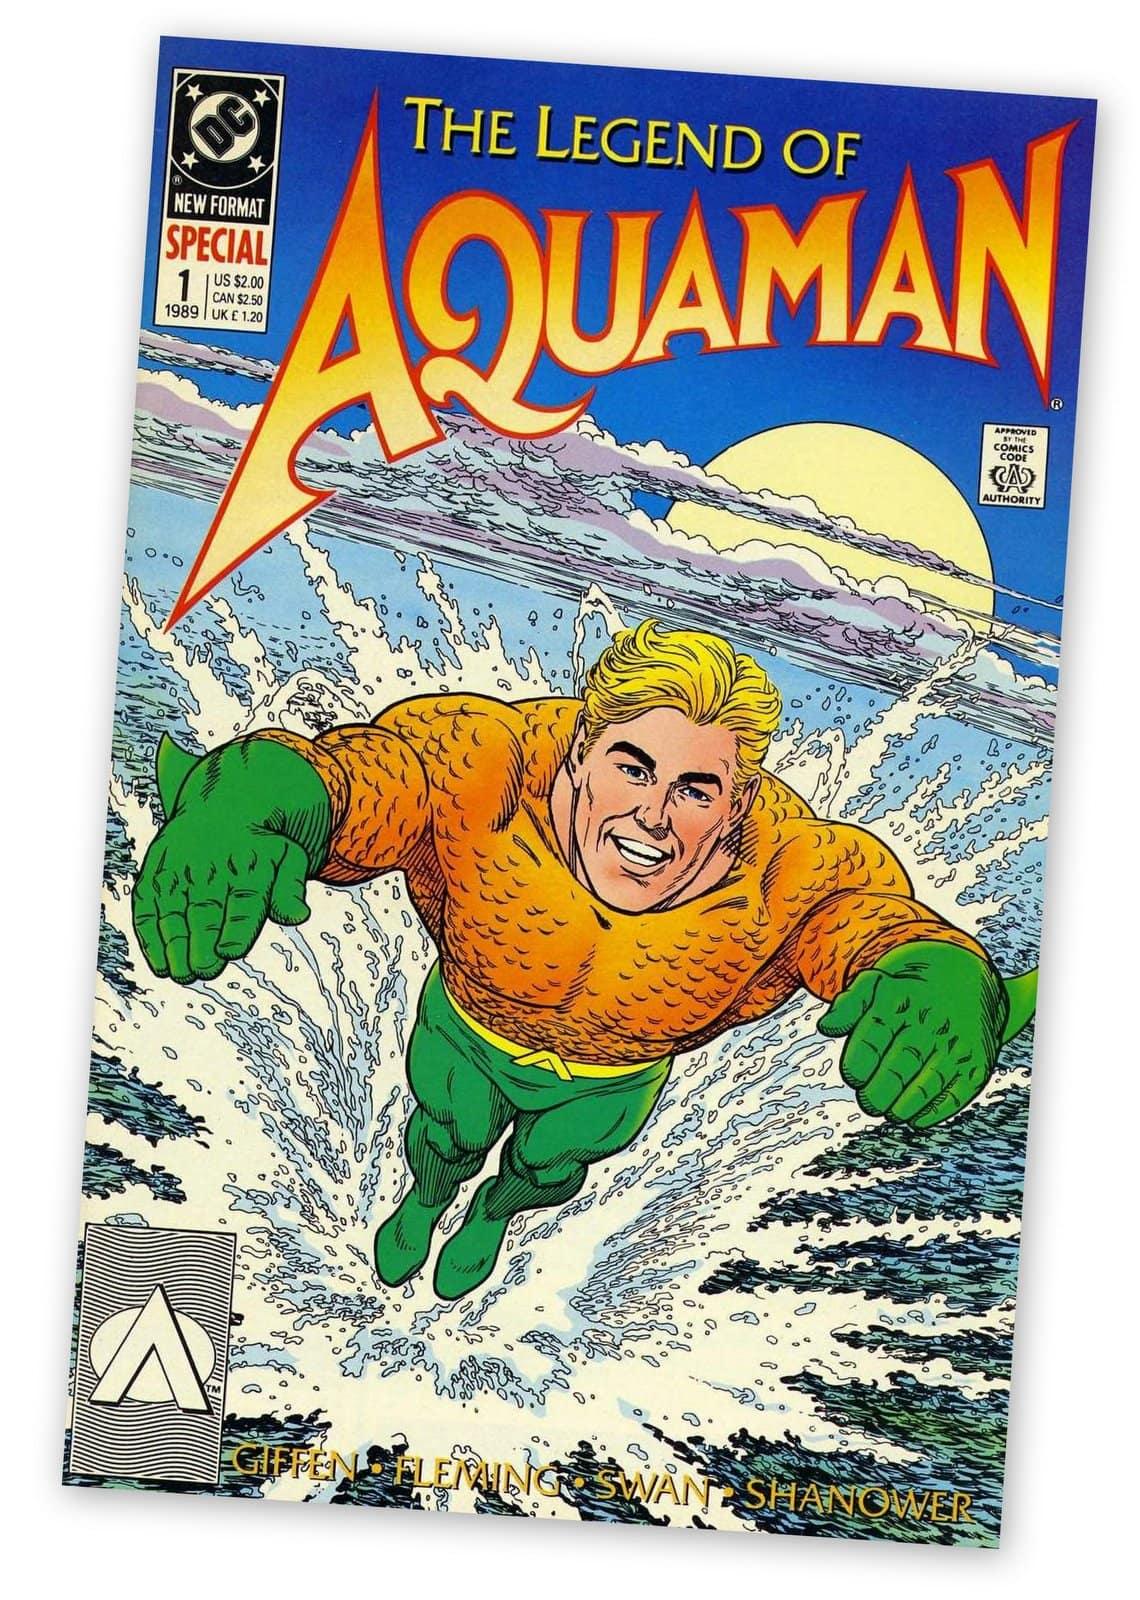 Vintage 1989 Aquaman comic book cover